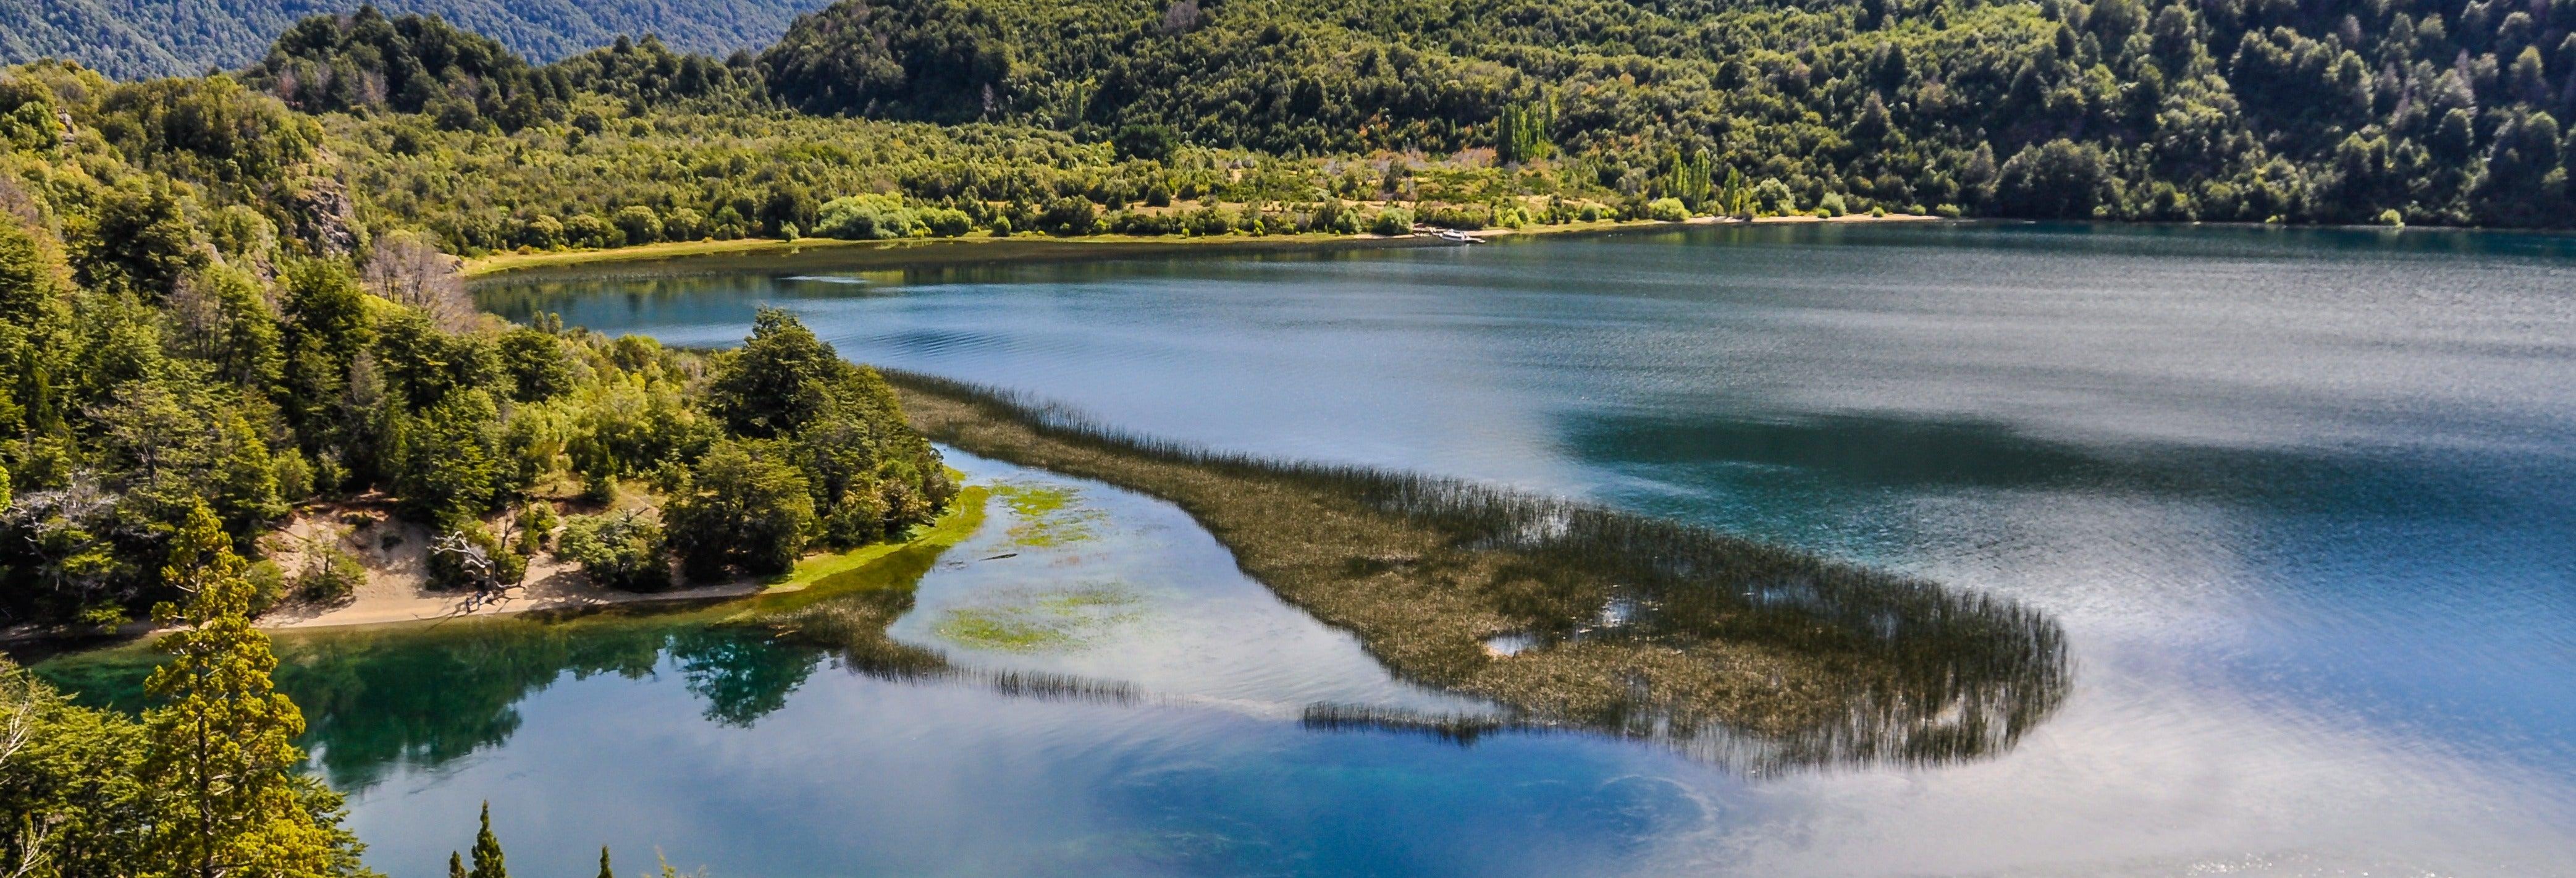 Alerce Andino National Park Trek